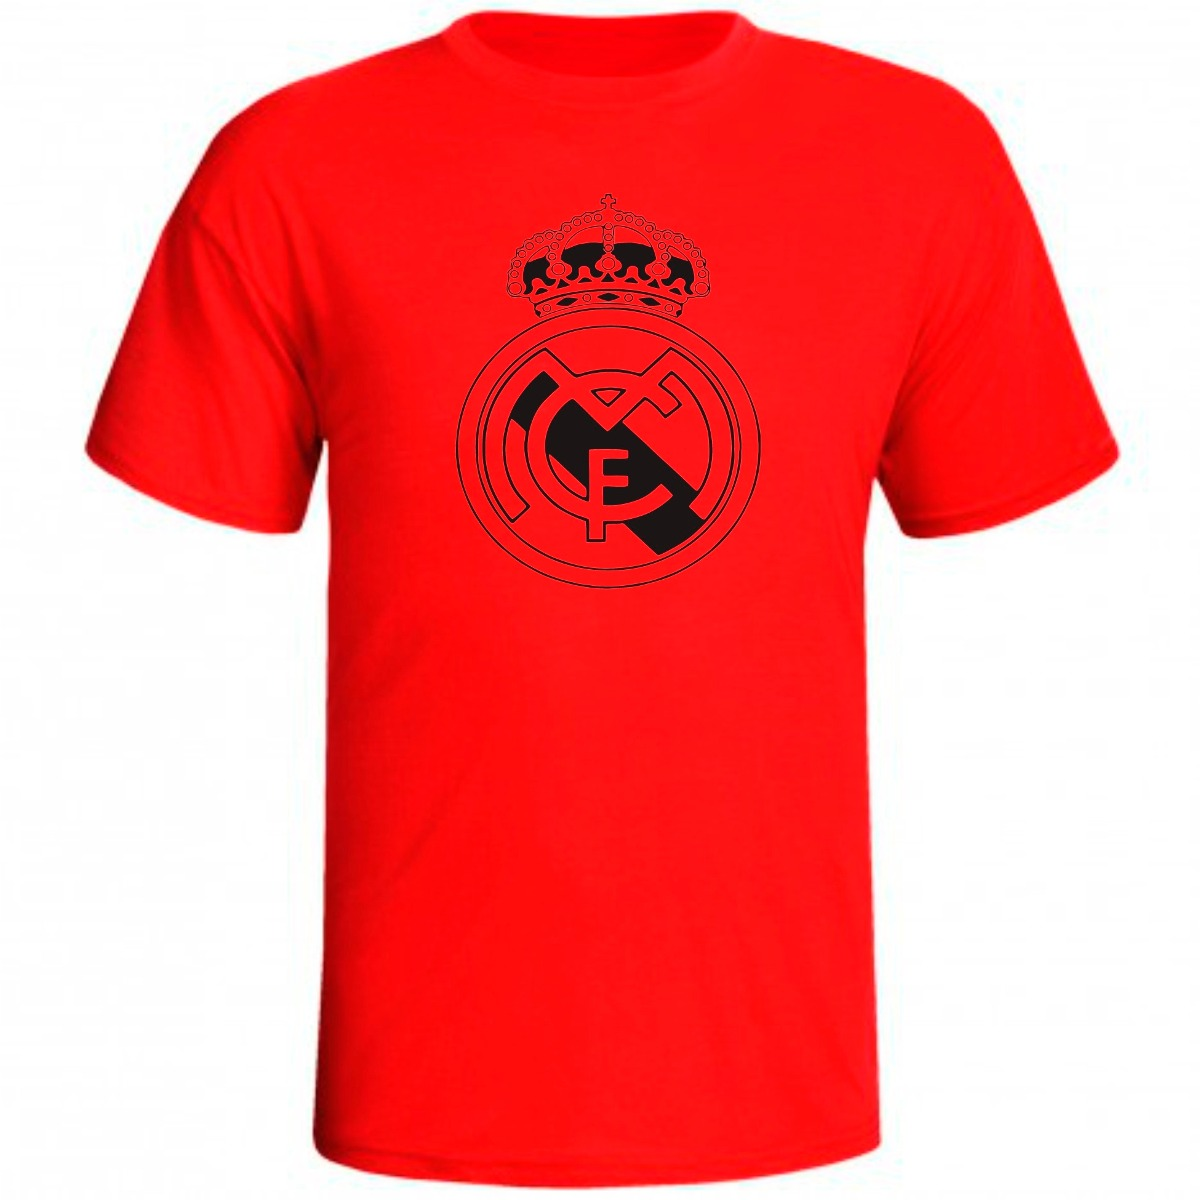 bdc4dee09d camiseta real madrid passeio personalizado passeio balada. Carregando zoom.